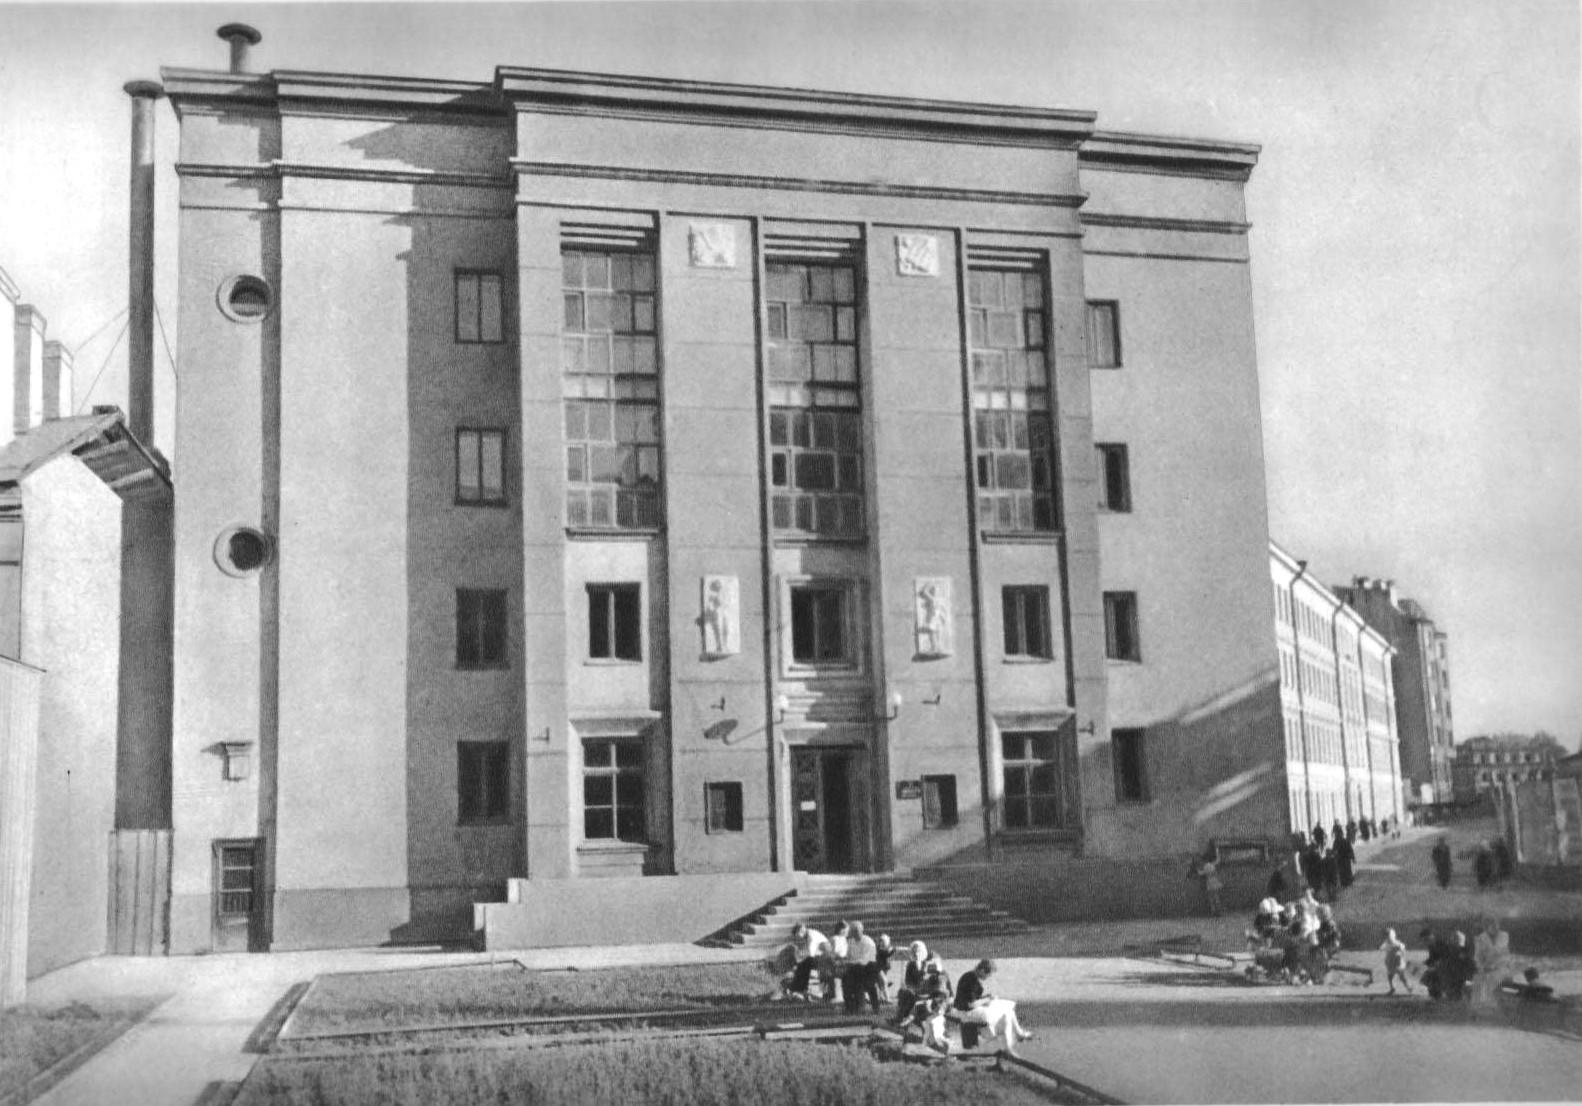 Школа наСадовой улице, Ленинград. Арх. И.И.Фомин,  Е.А.Левинсон, 1938.